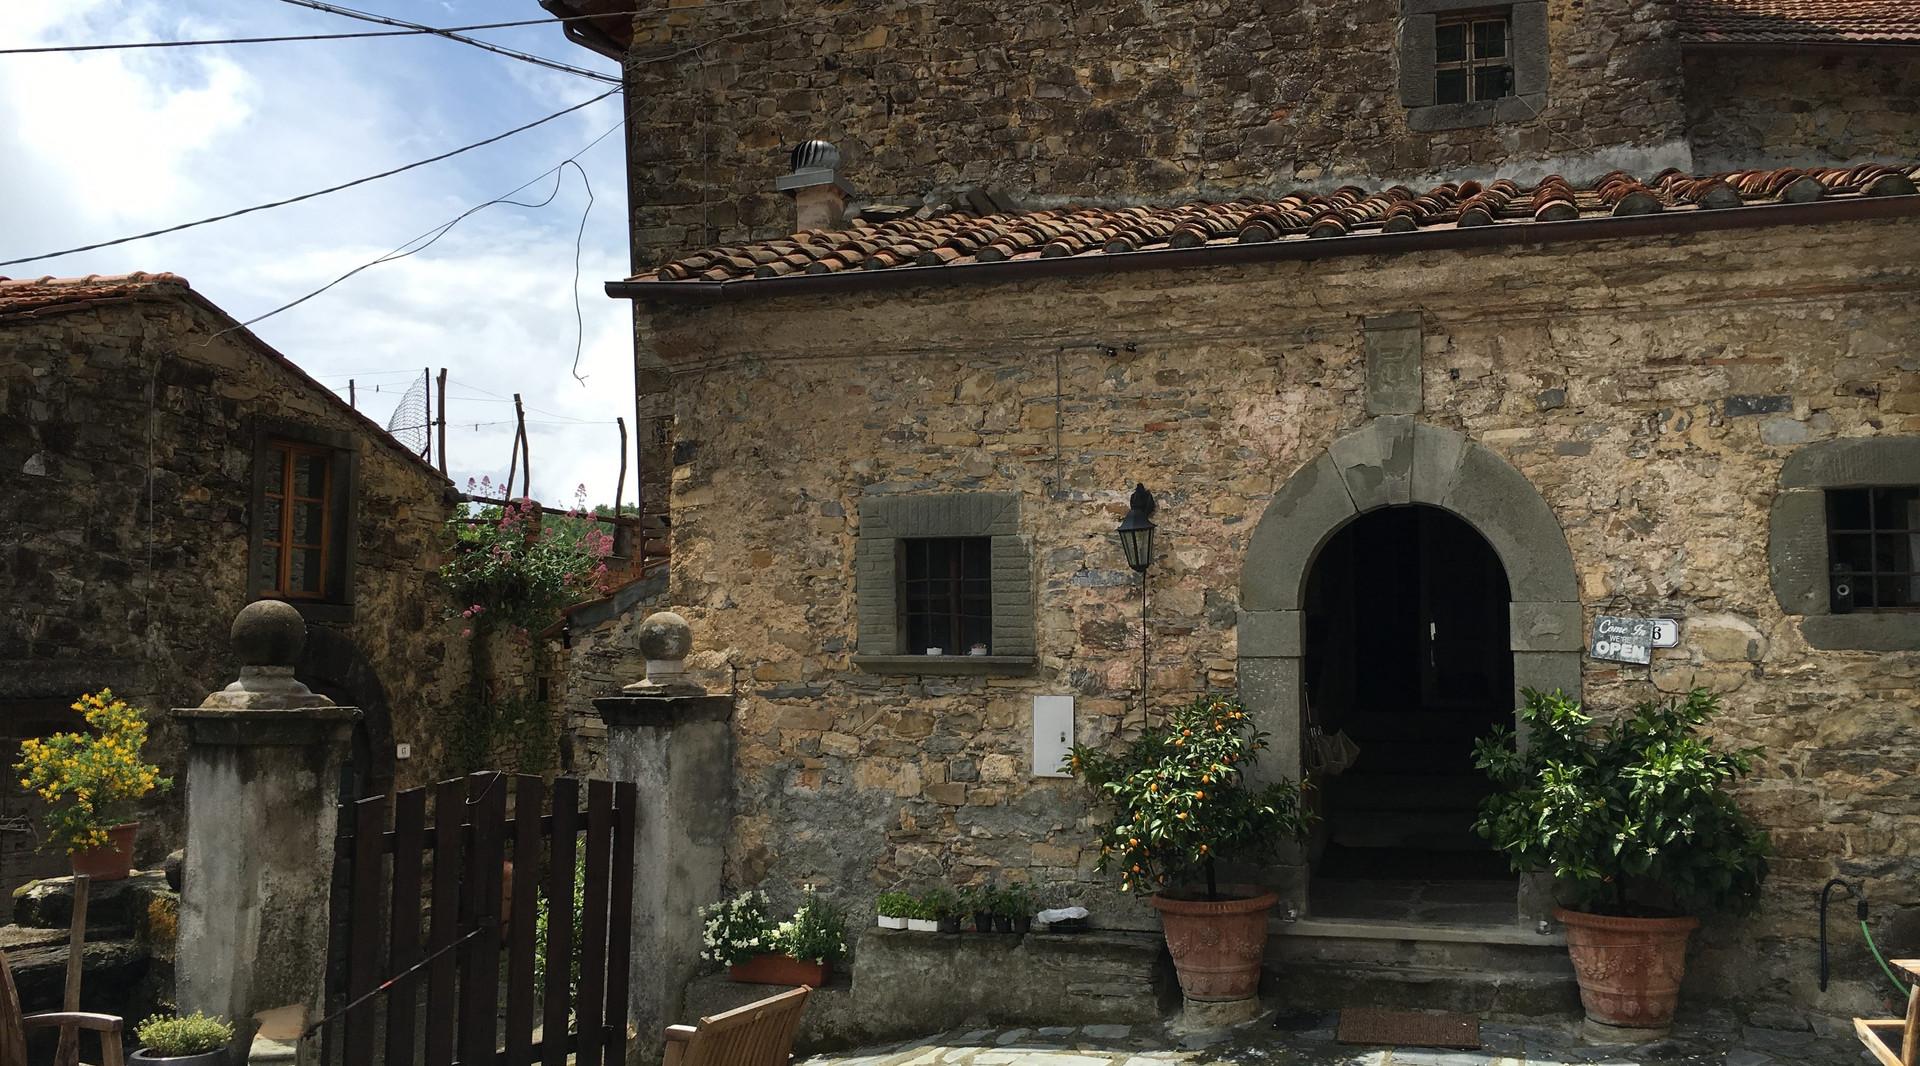 agriturismo b&b Luna di Quarazzana Lunigiana entrance and courtyard